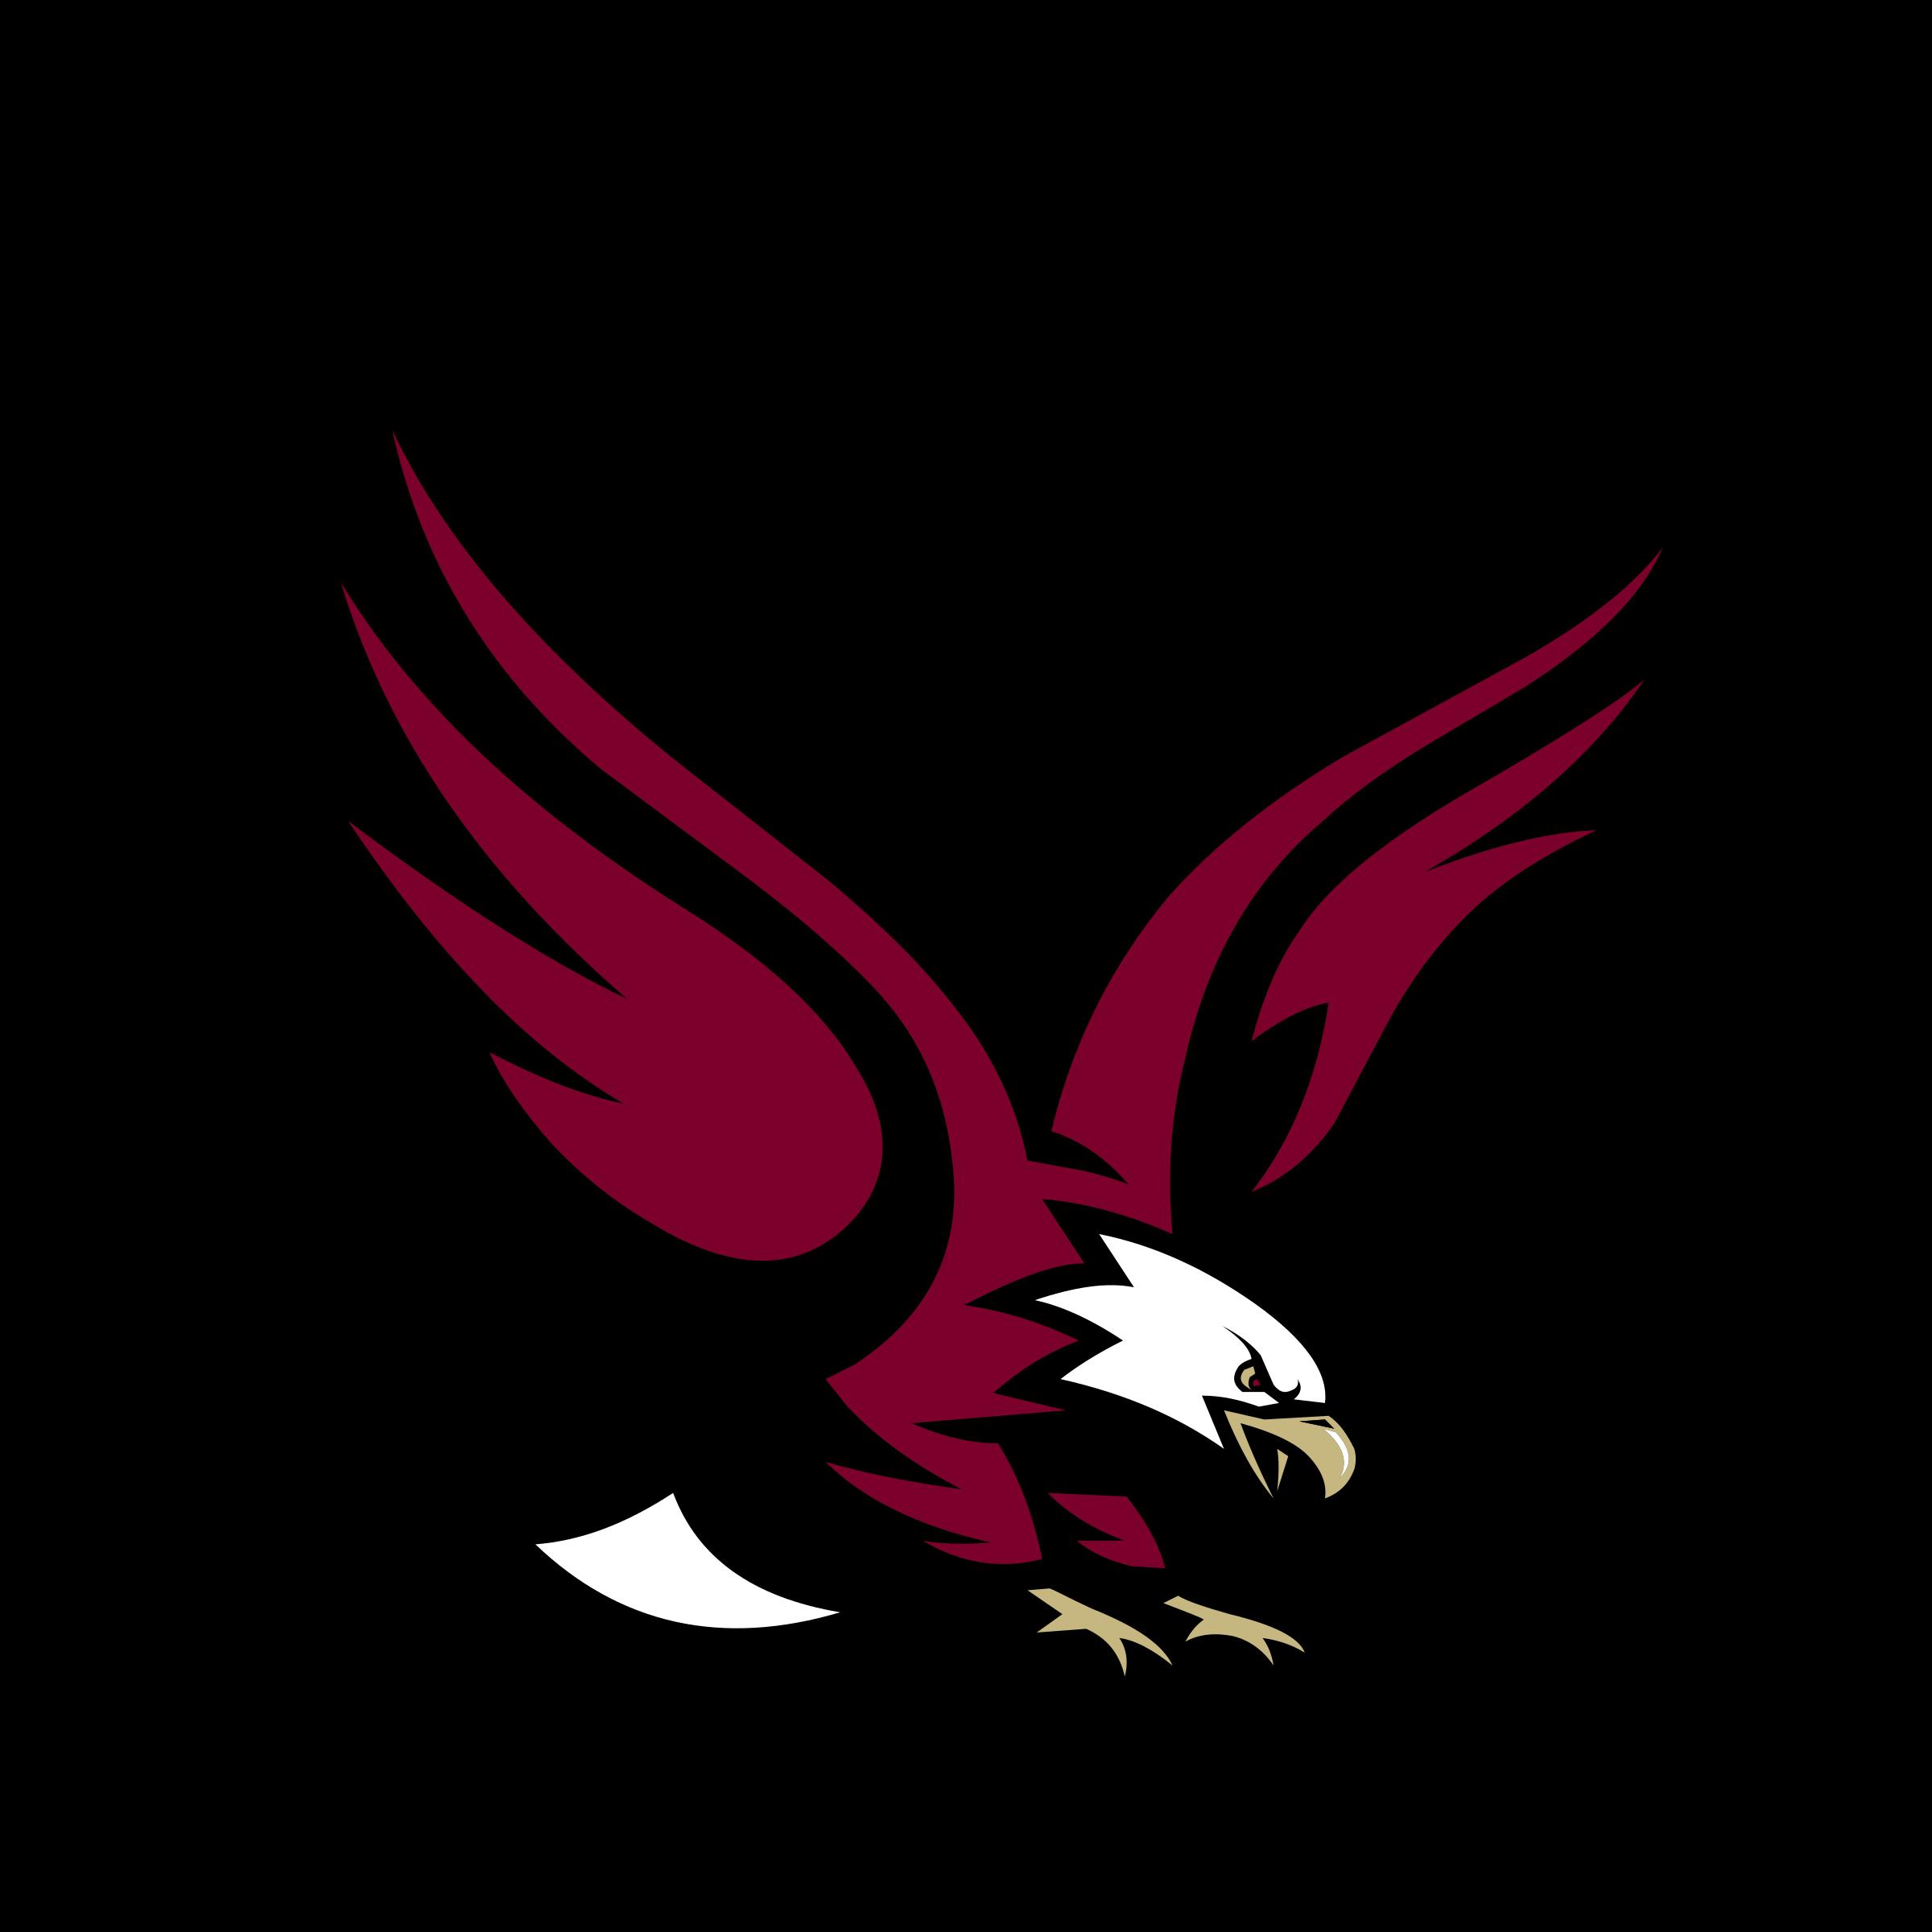 Boston college eagles logo. Eagle vector png